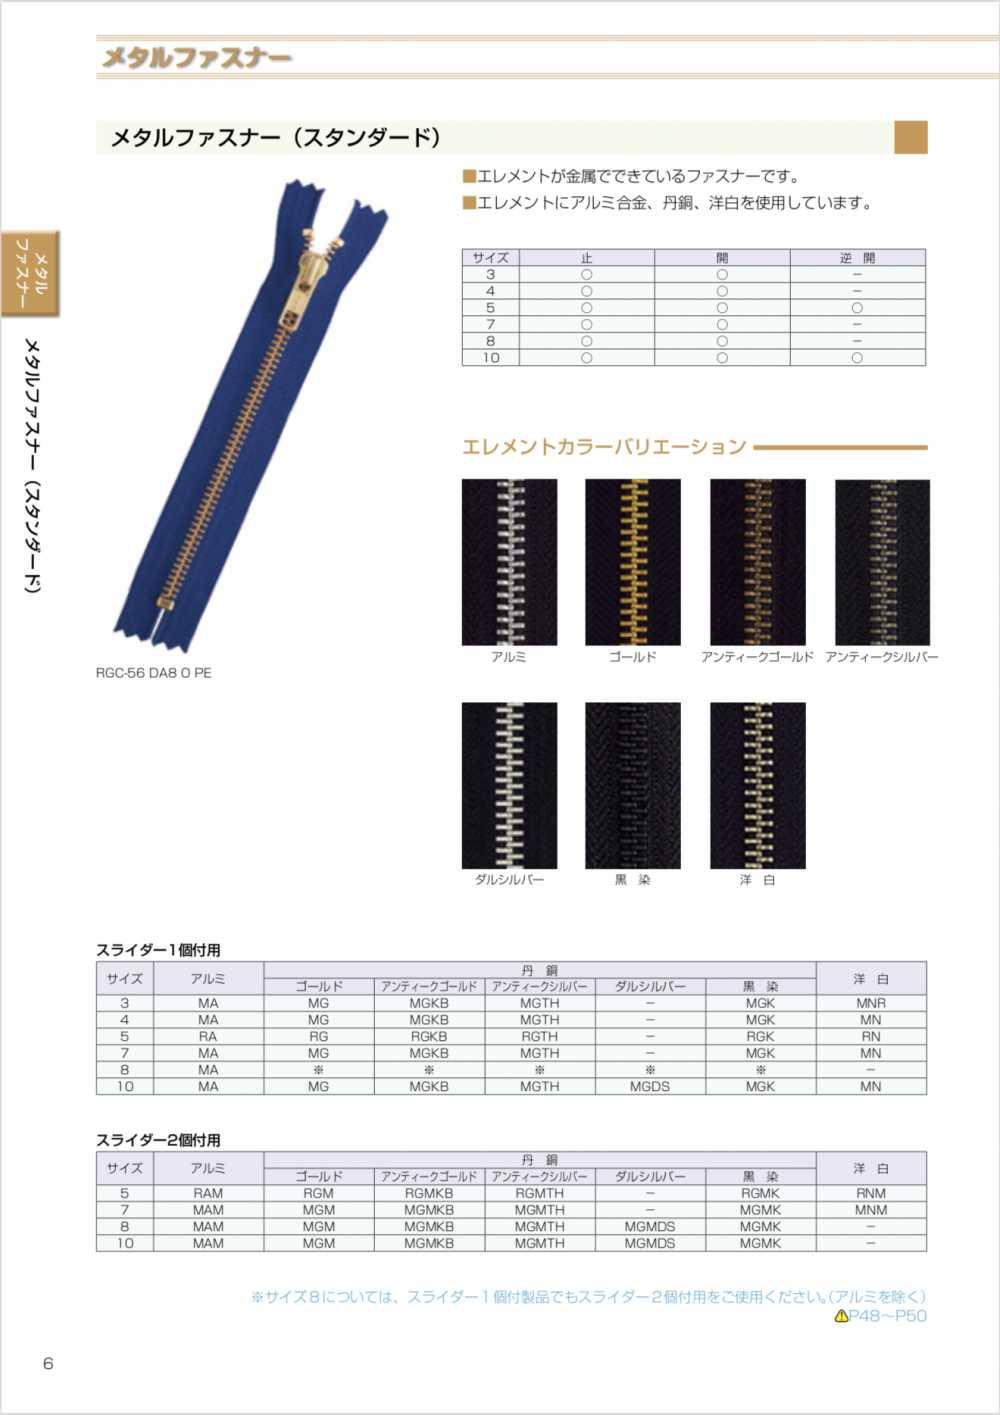 10MAC YKKファスナー 10サイズ アルミ 止め YKK/オークラ商事 - ApparelX アパレル資材卸通販